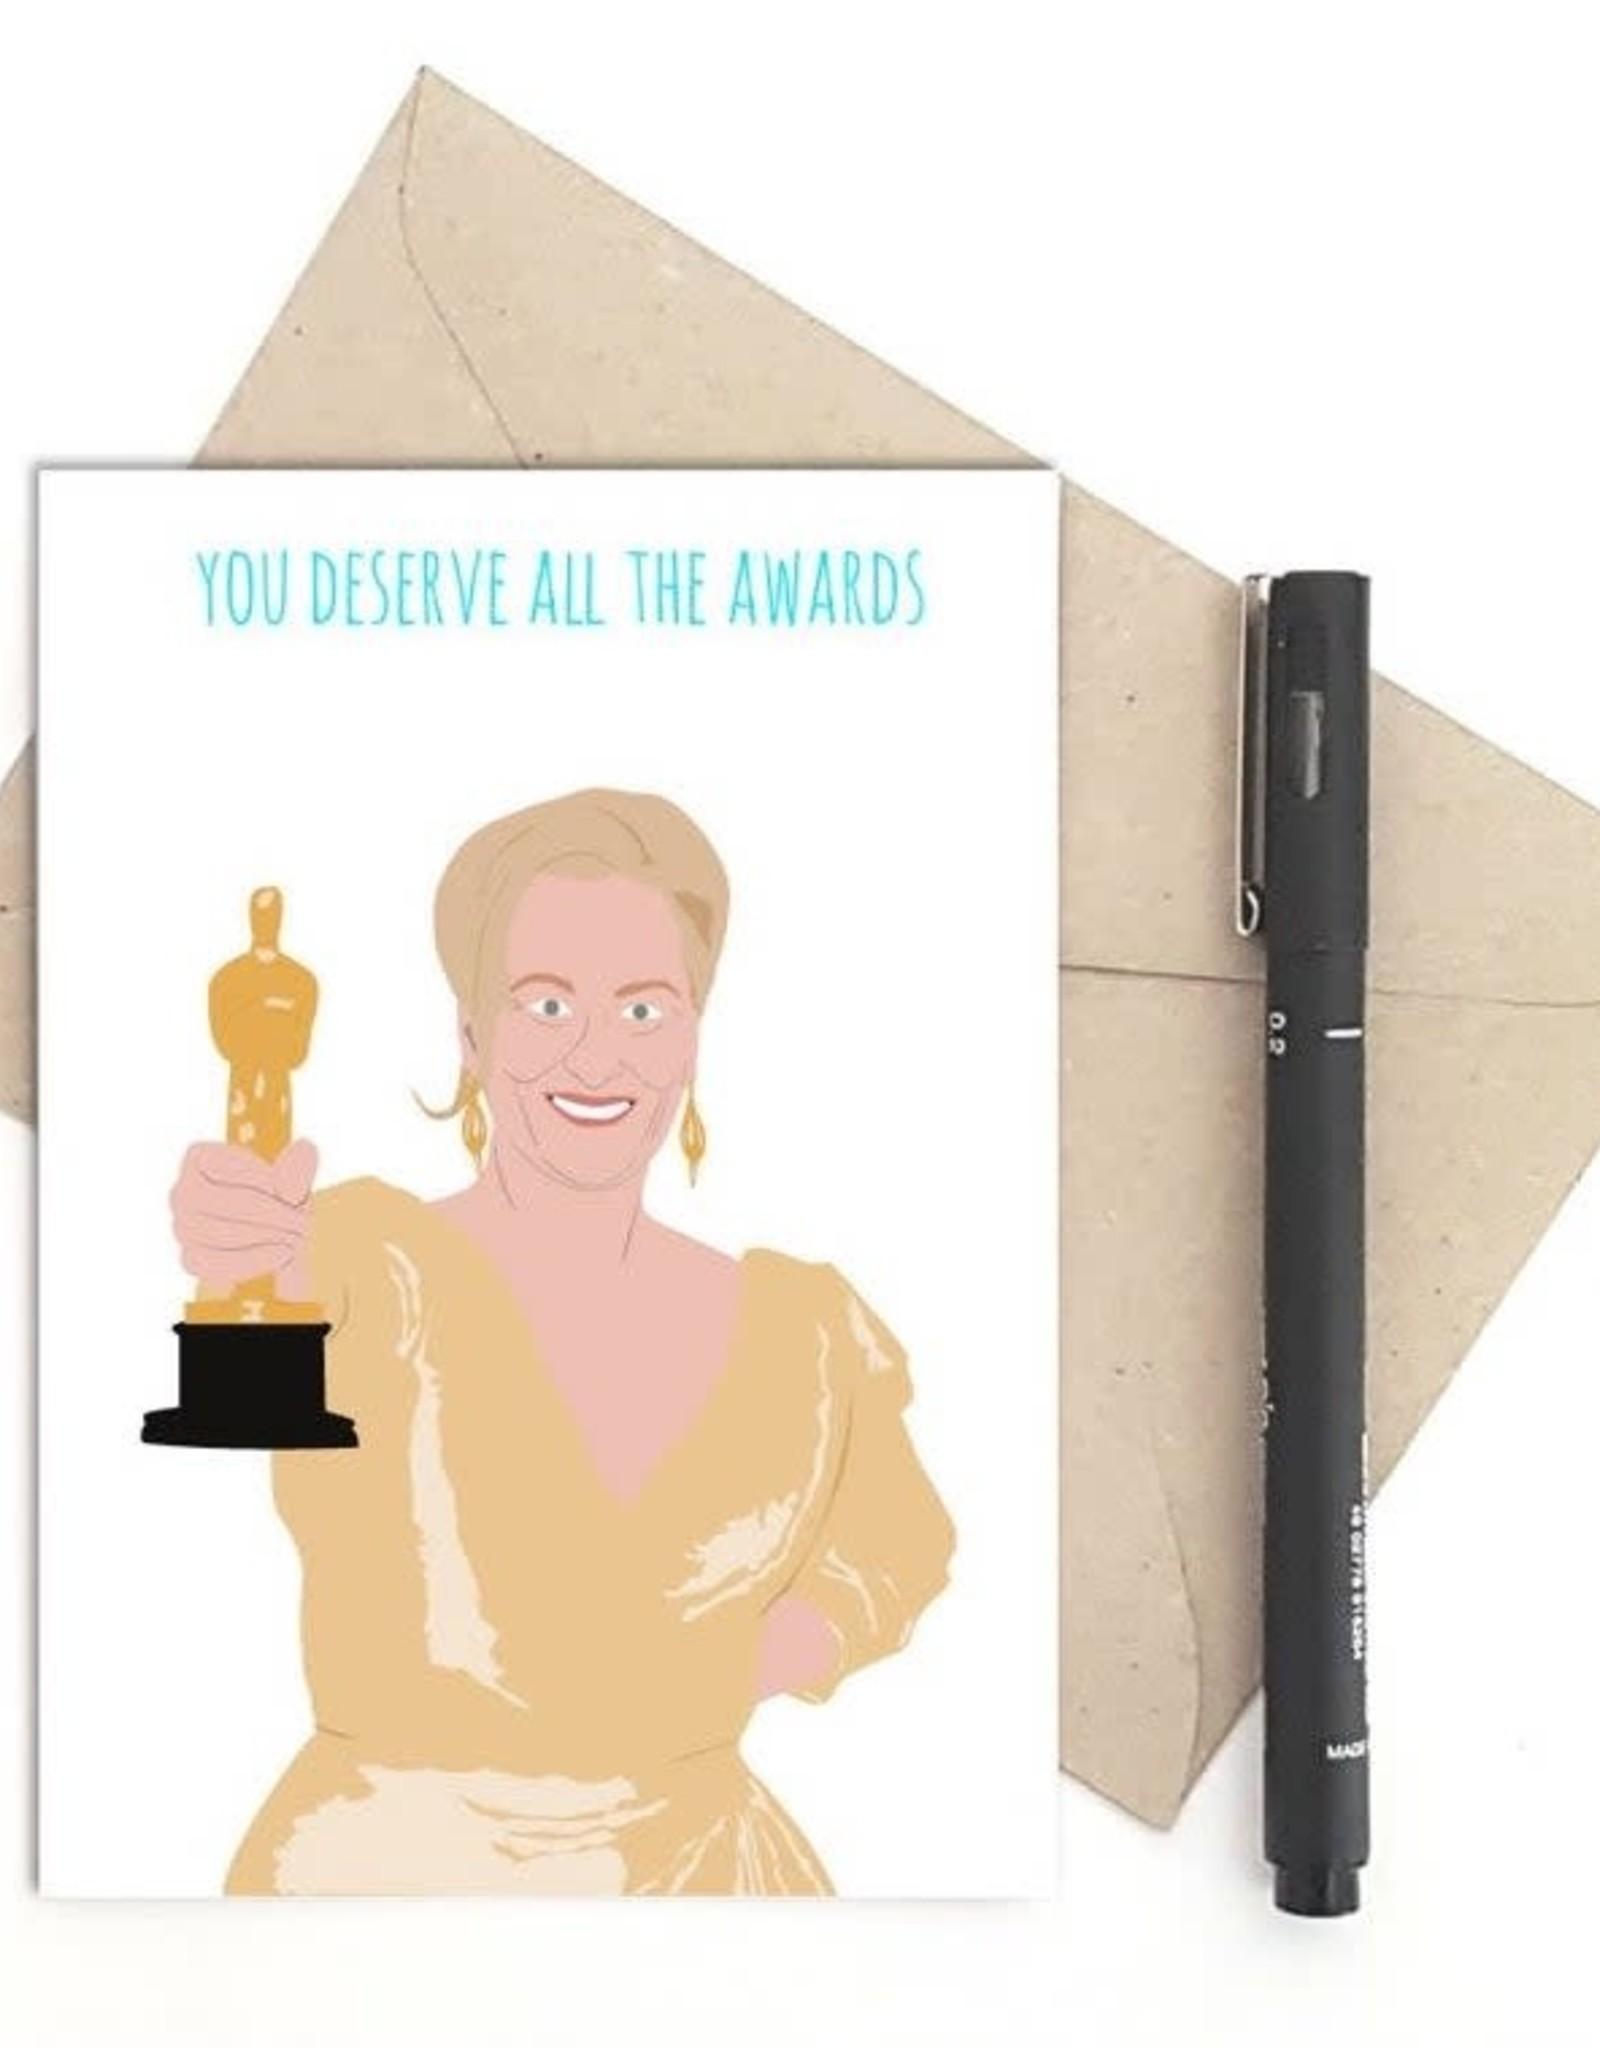 All the Awards (Meryl Streep) Greeting Card